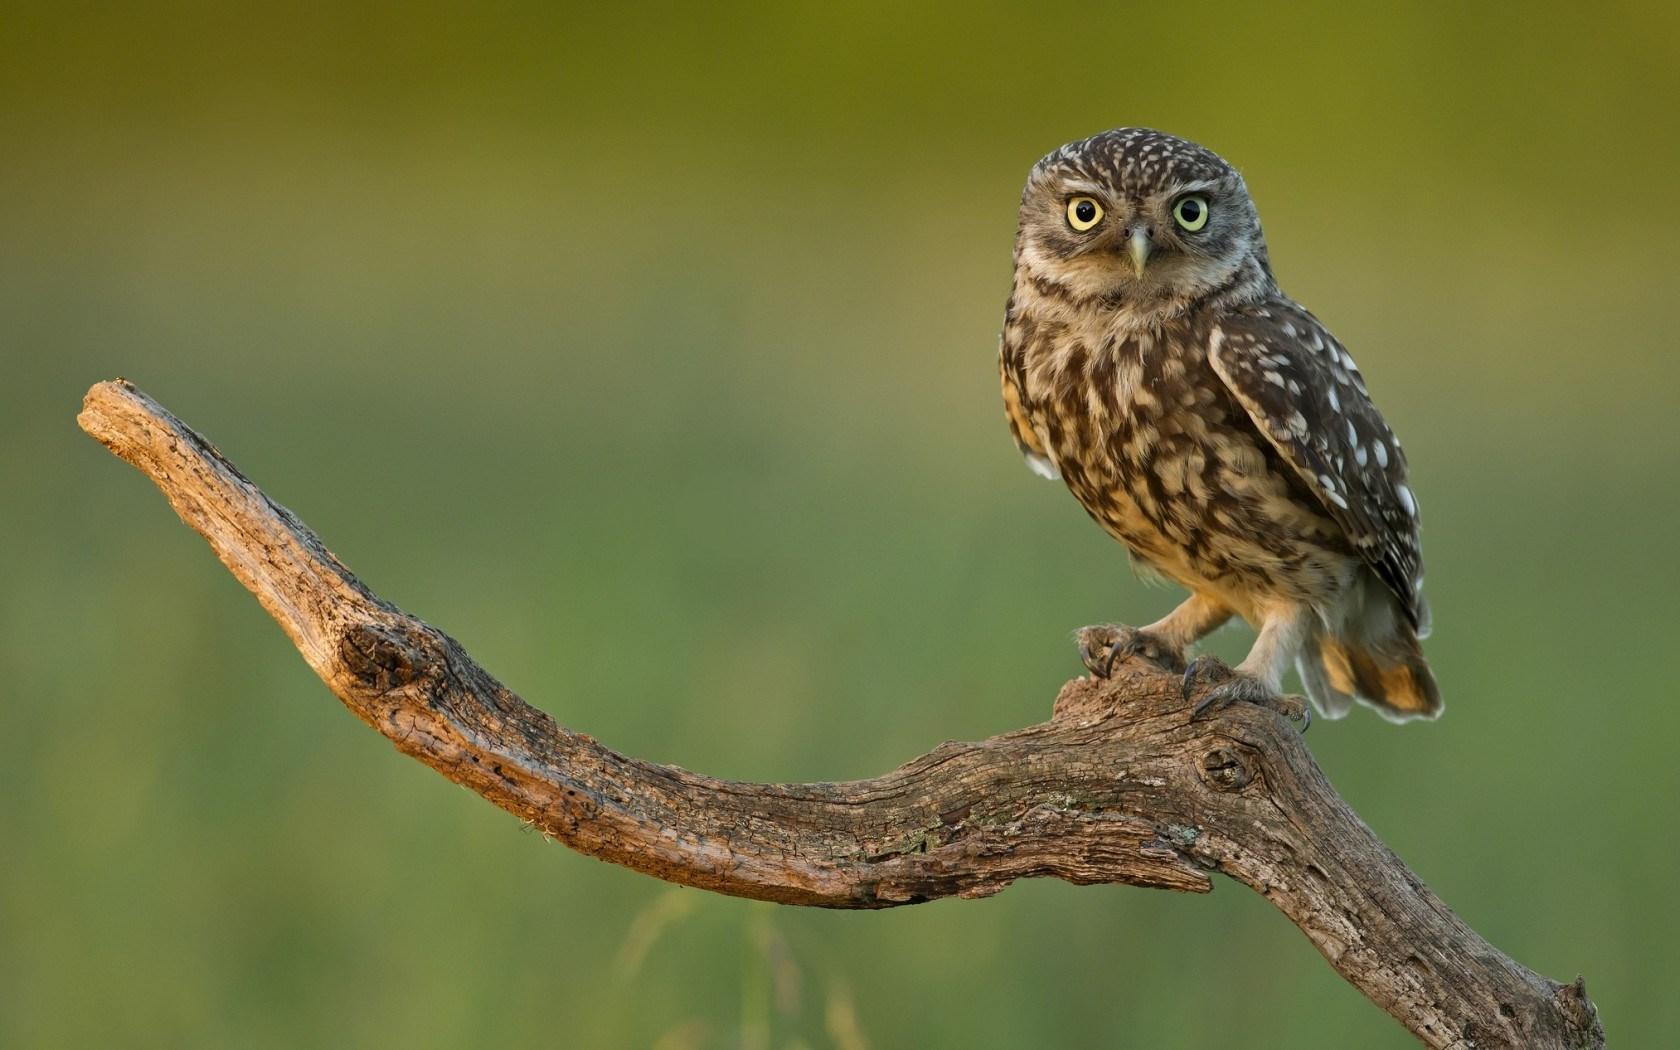 Owl Bird Nature Branch Dry Wood HD wallpaper 1680x1050 ...